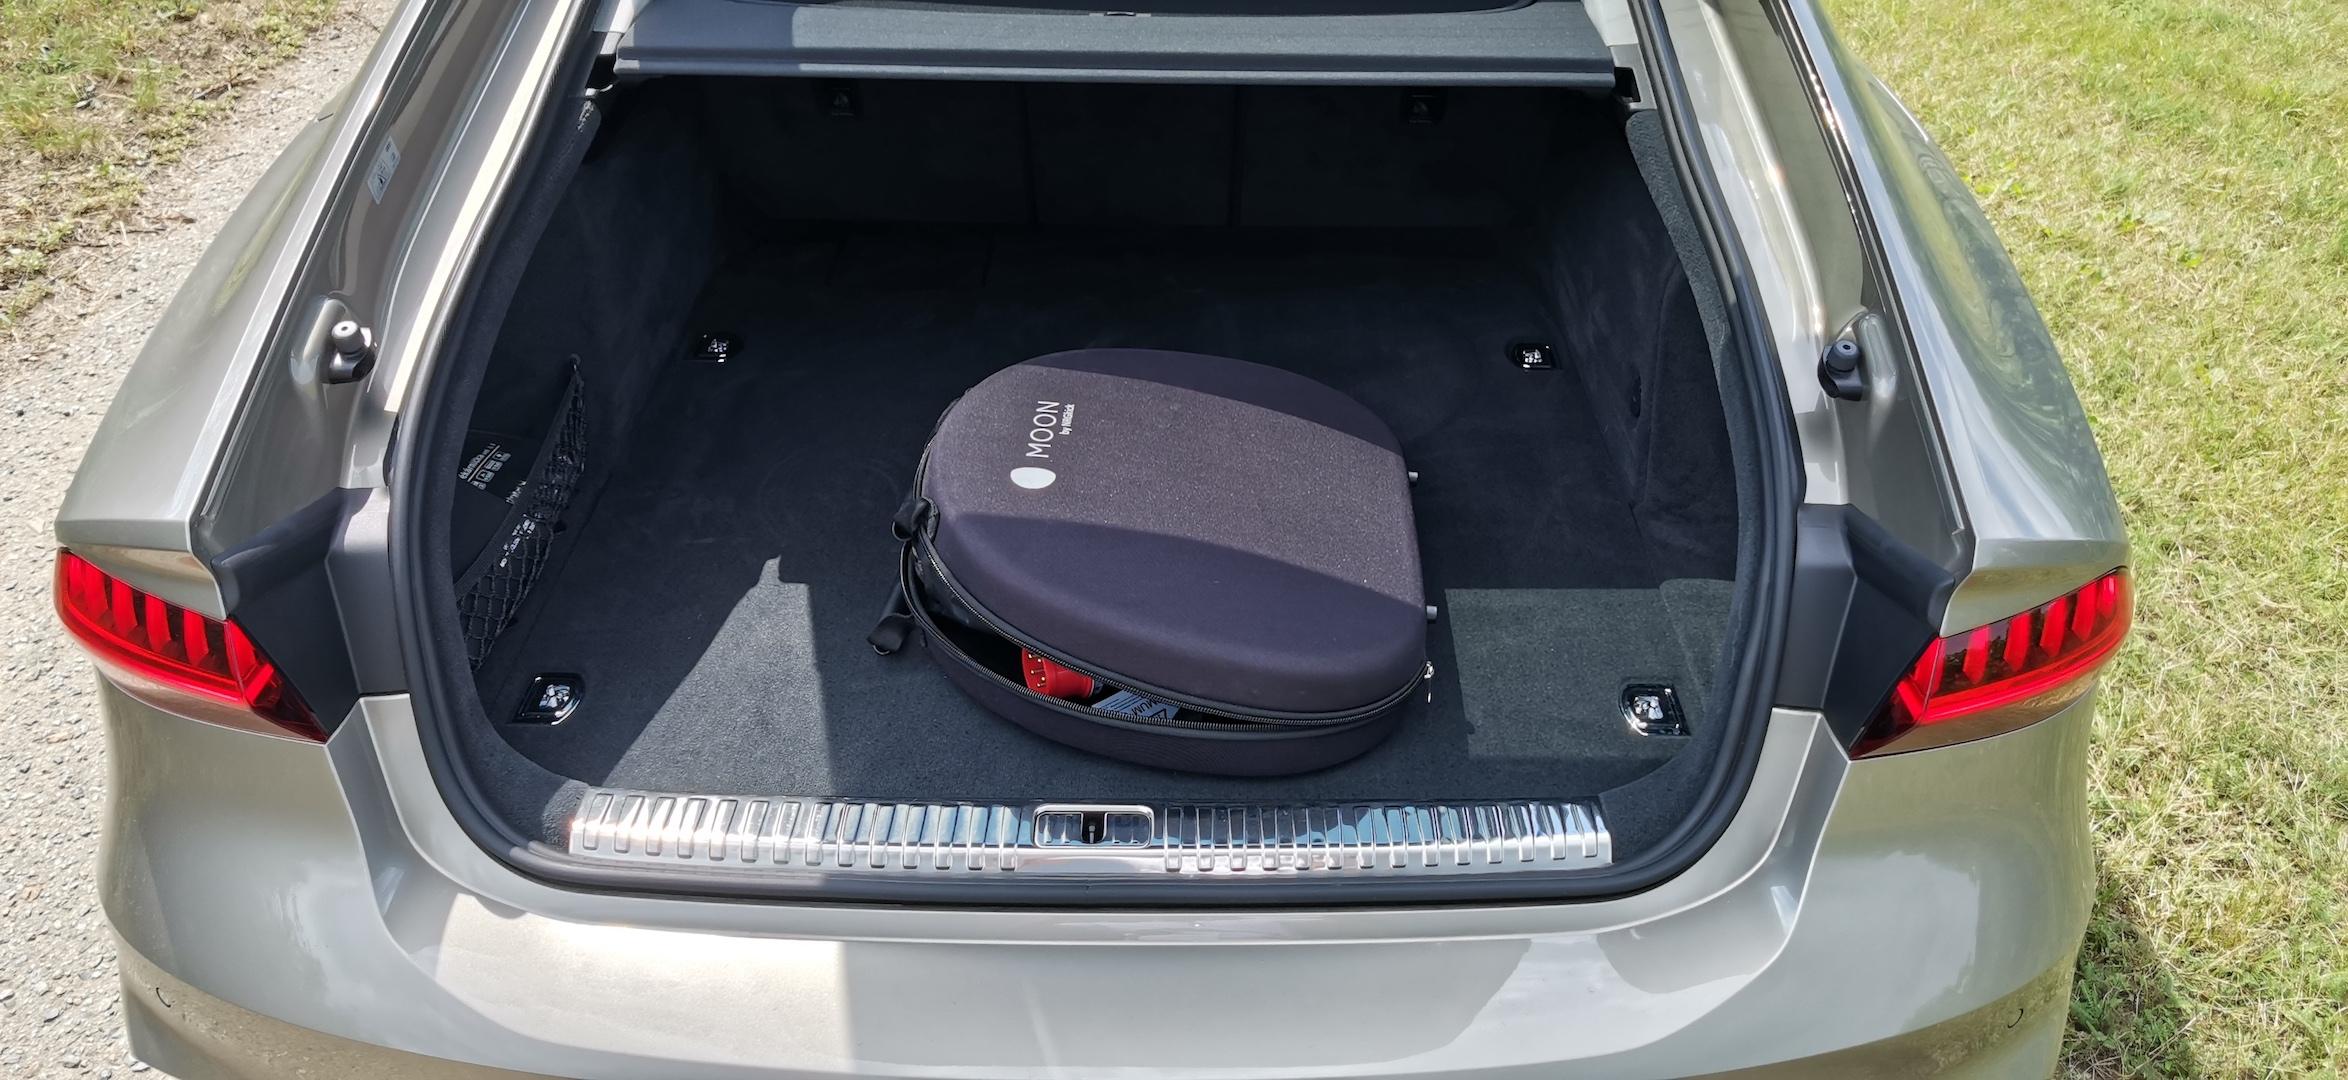 Audi A7 Sportback 55 TFSI e Quattro - zavazadlový prostor